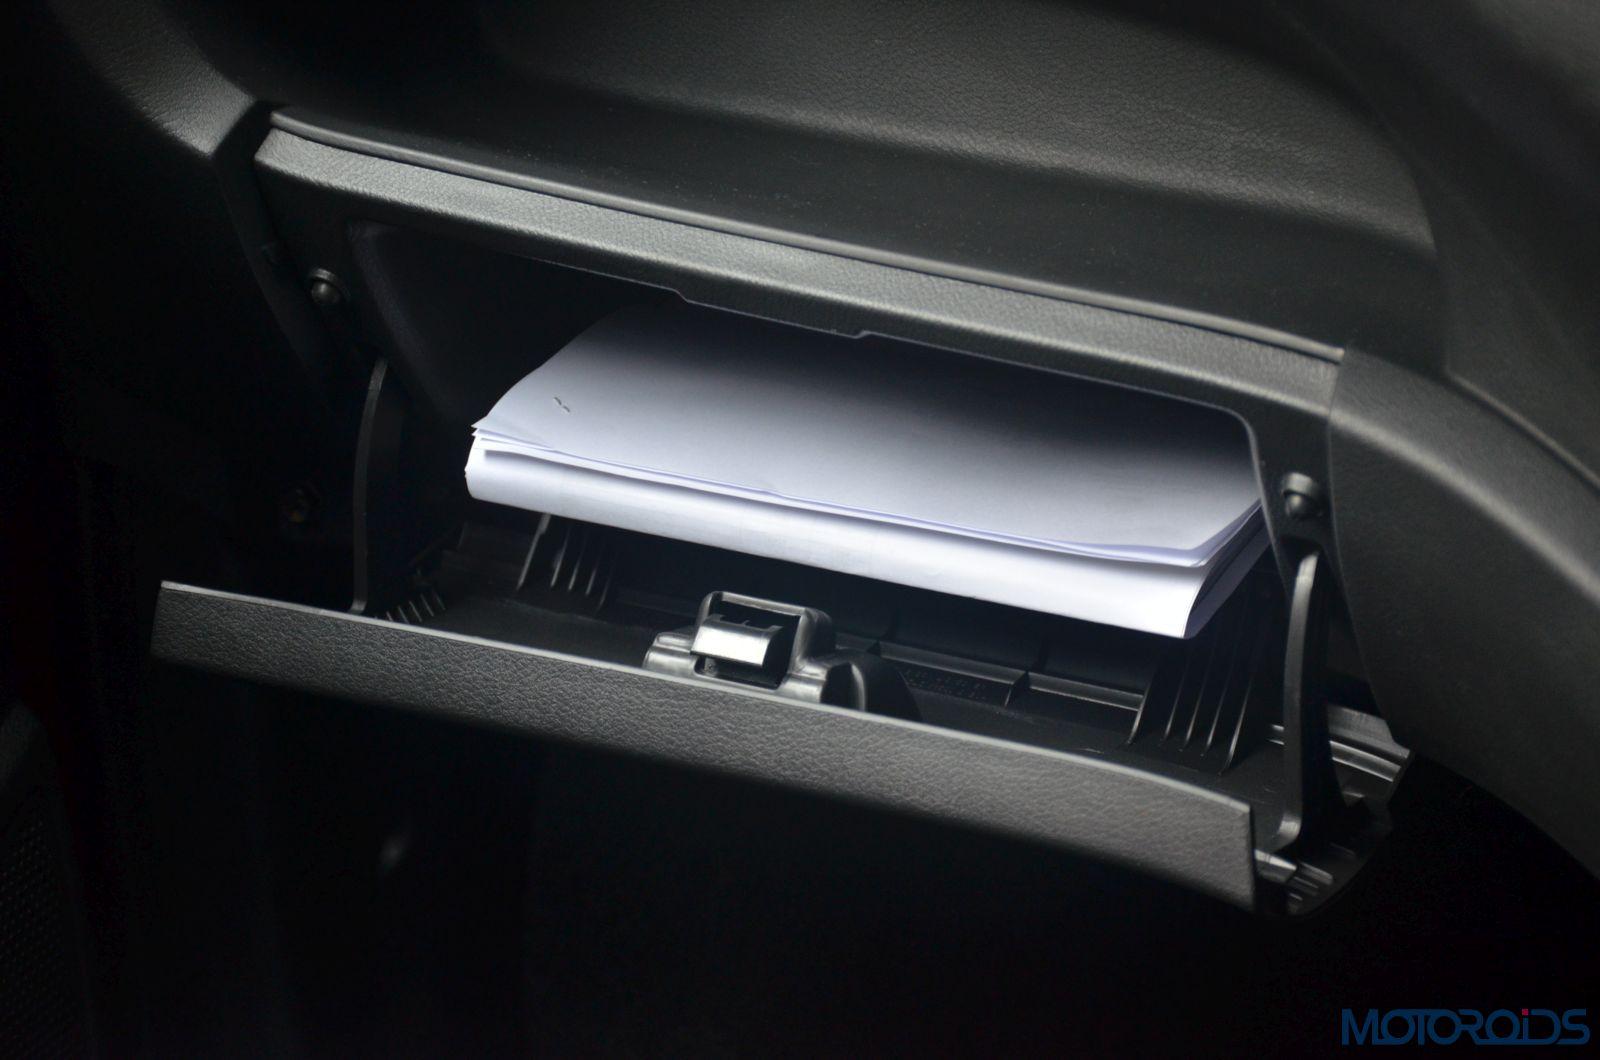 July 13, 2017-New-Datsun-redi-GO-1.0-Review-2.jpg